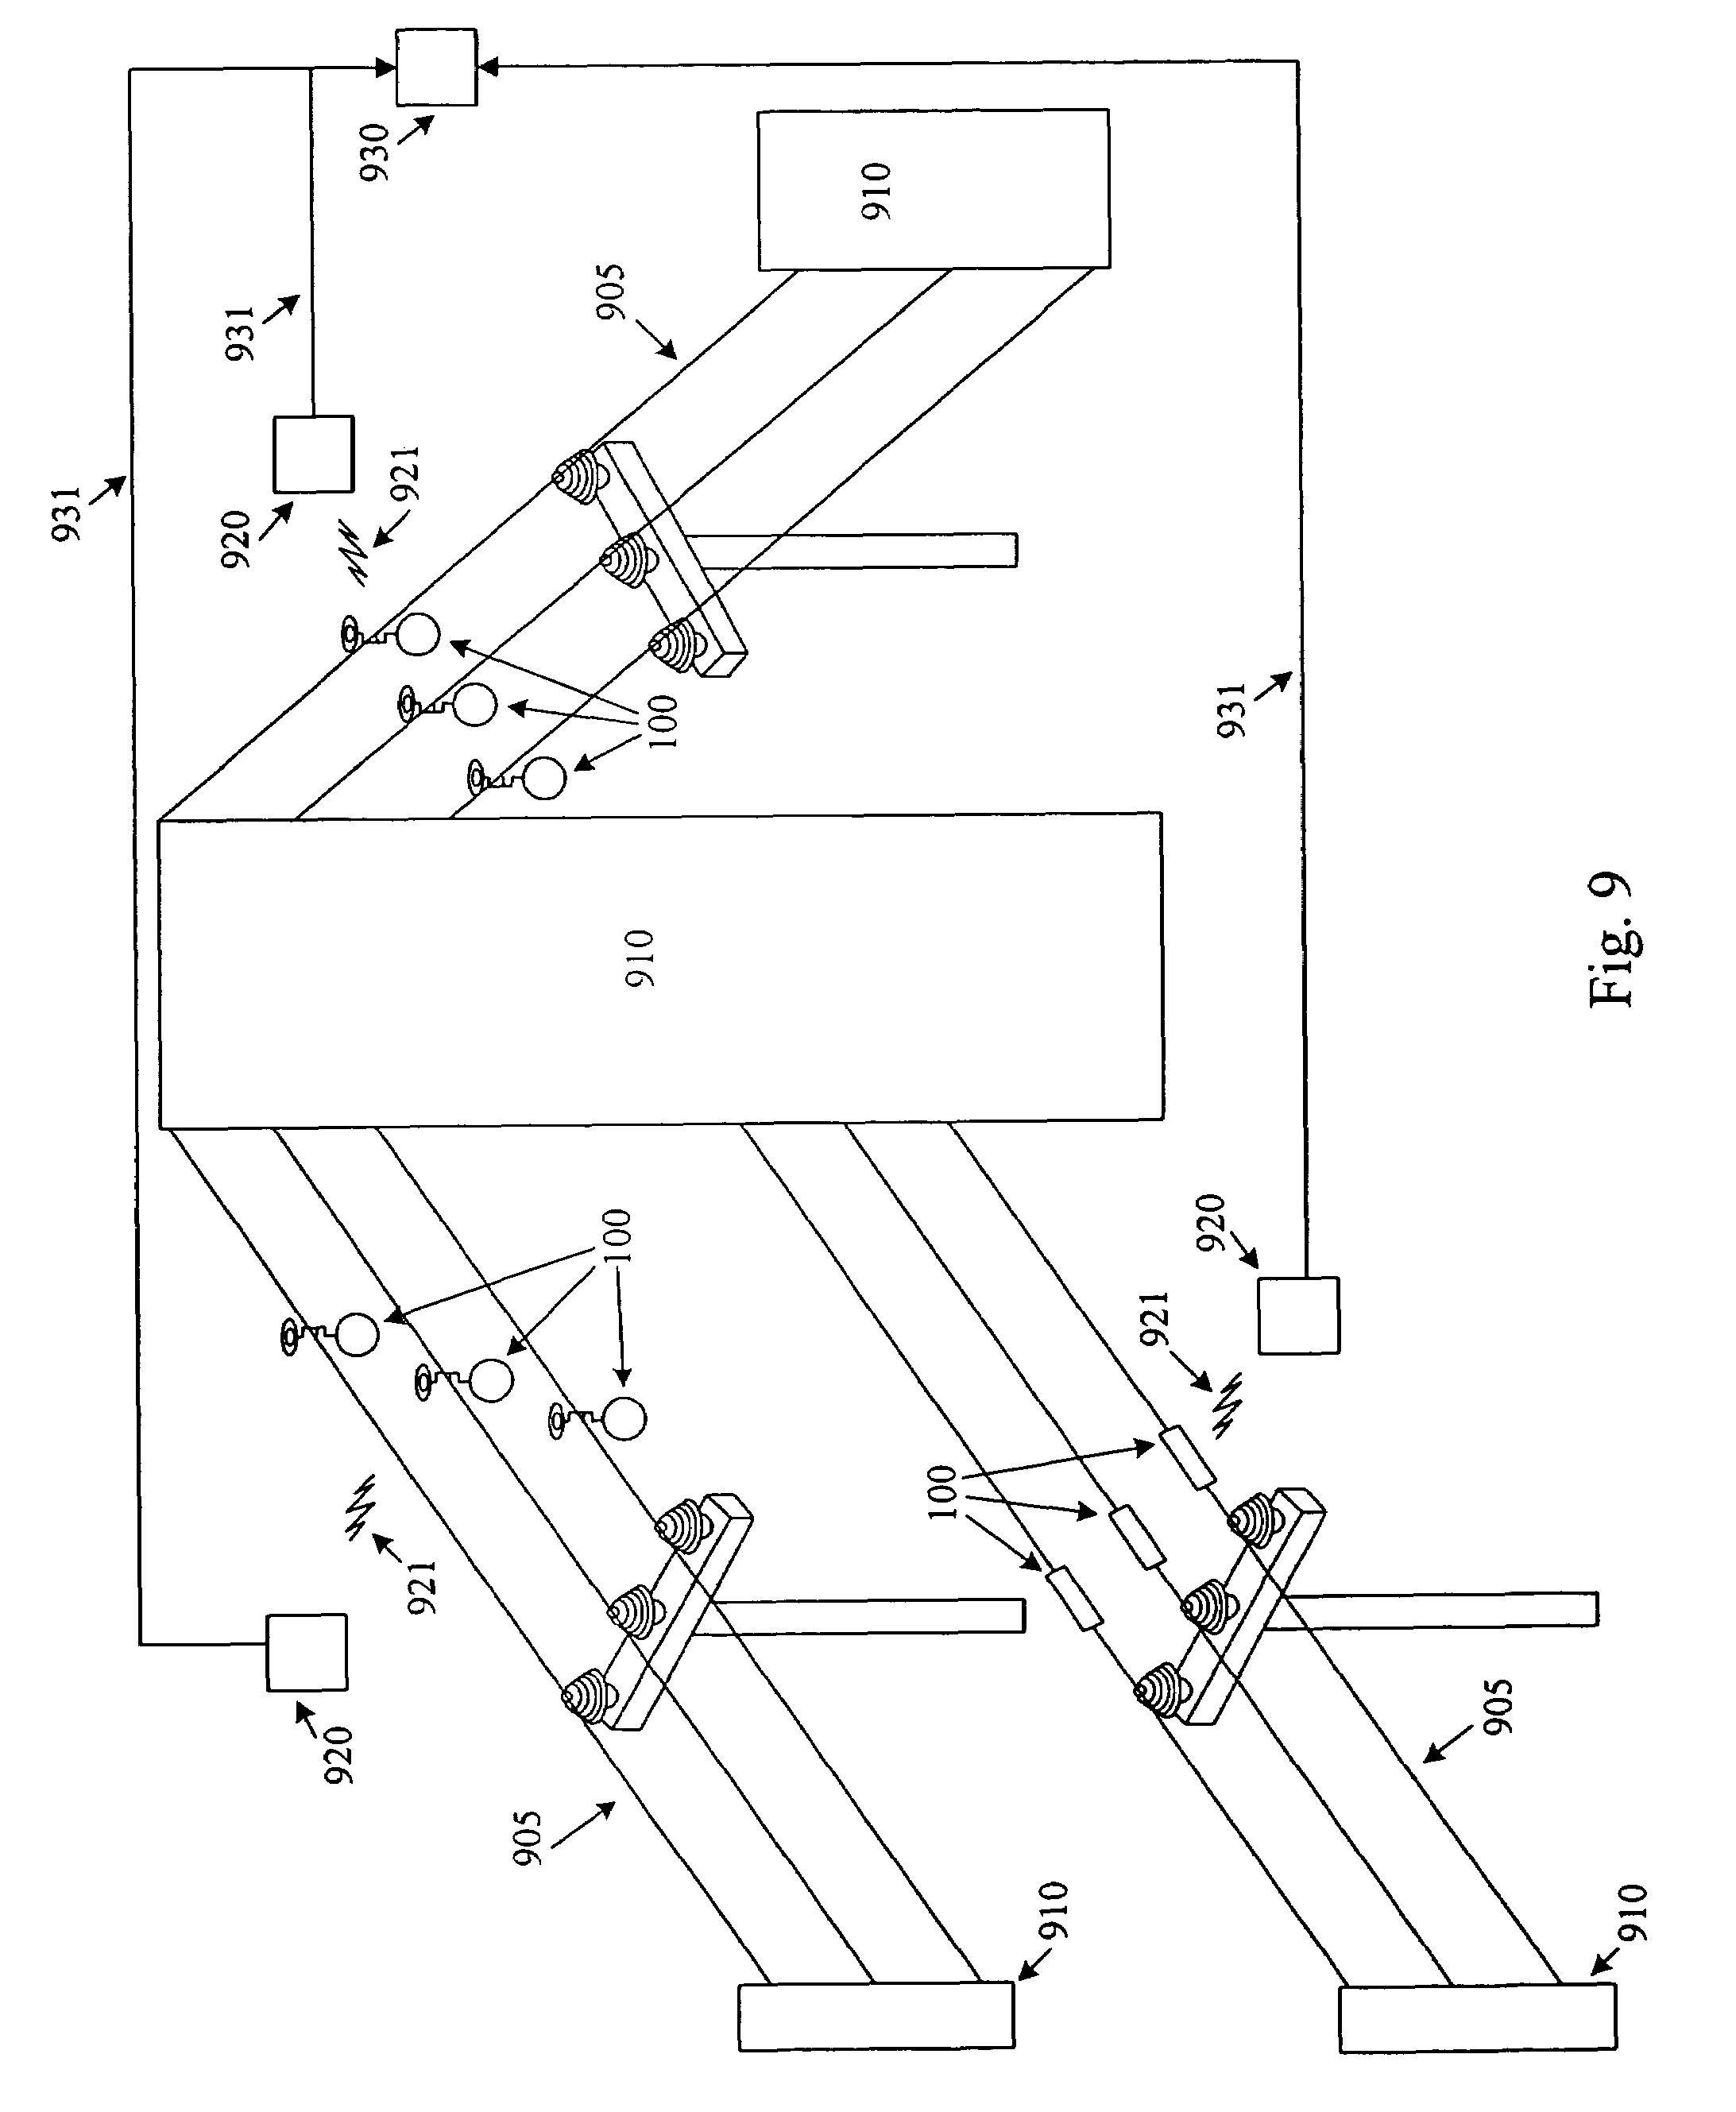 patente us7282944